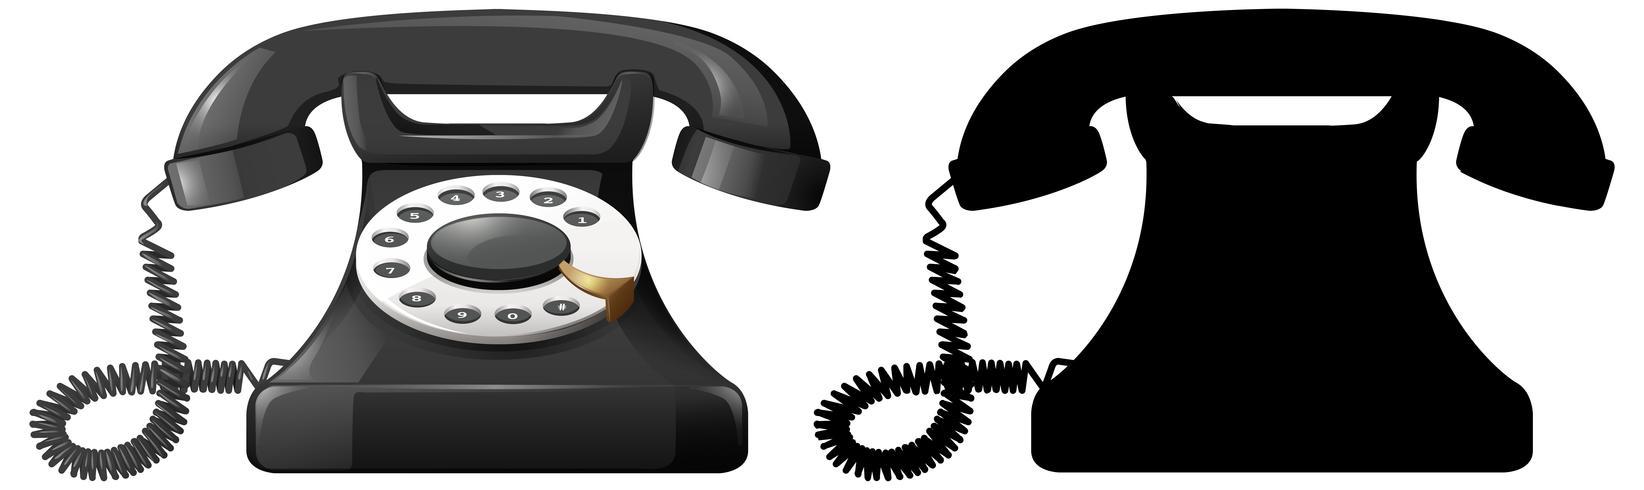 Sats med telefondesign vektor